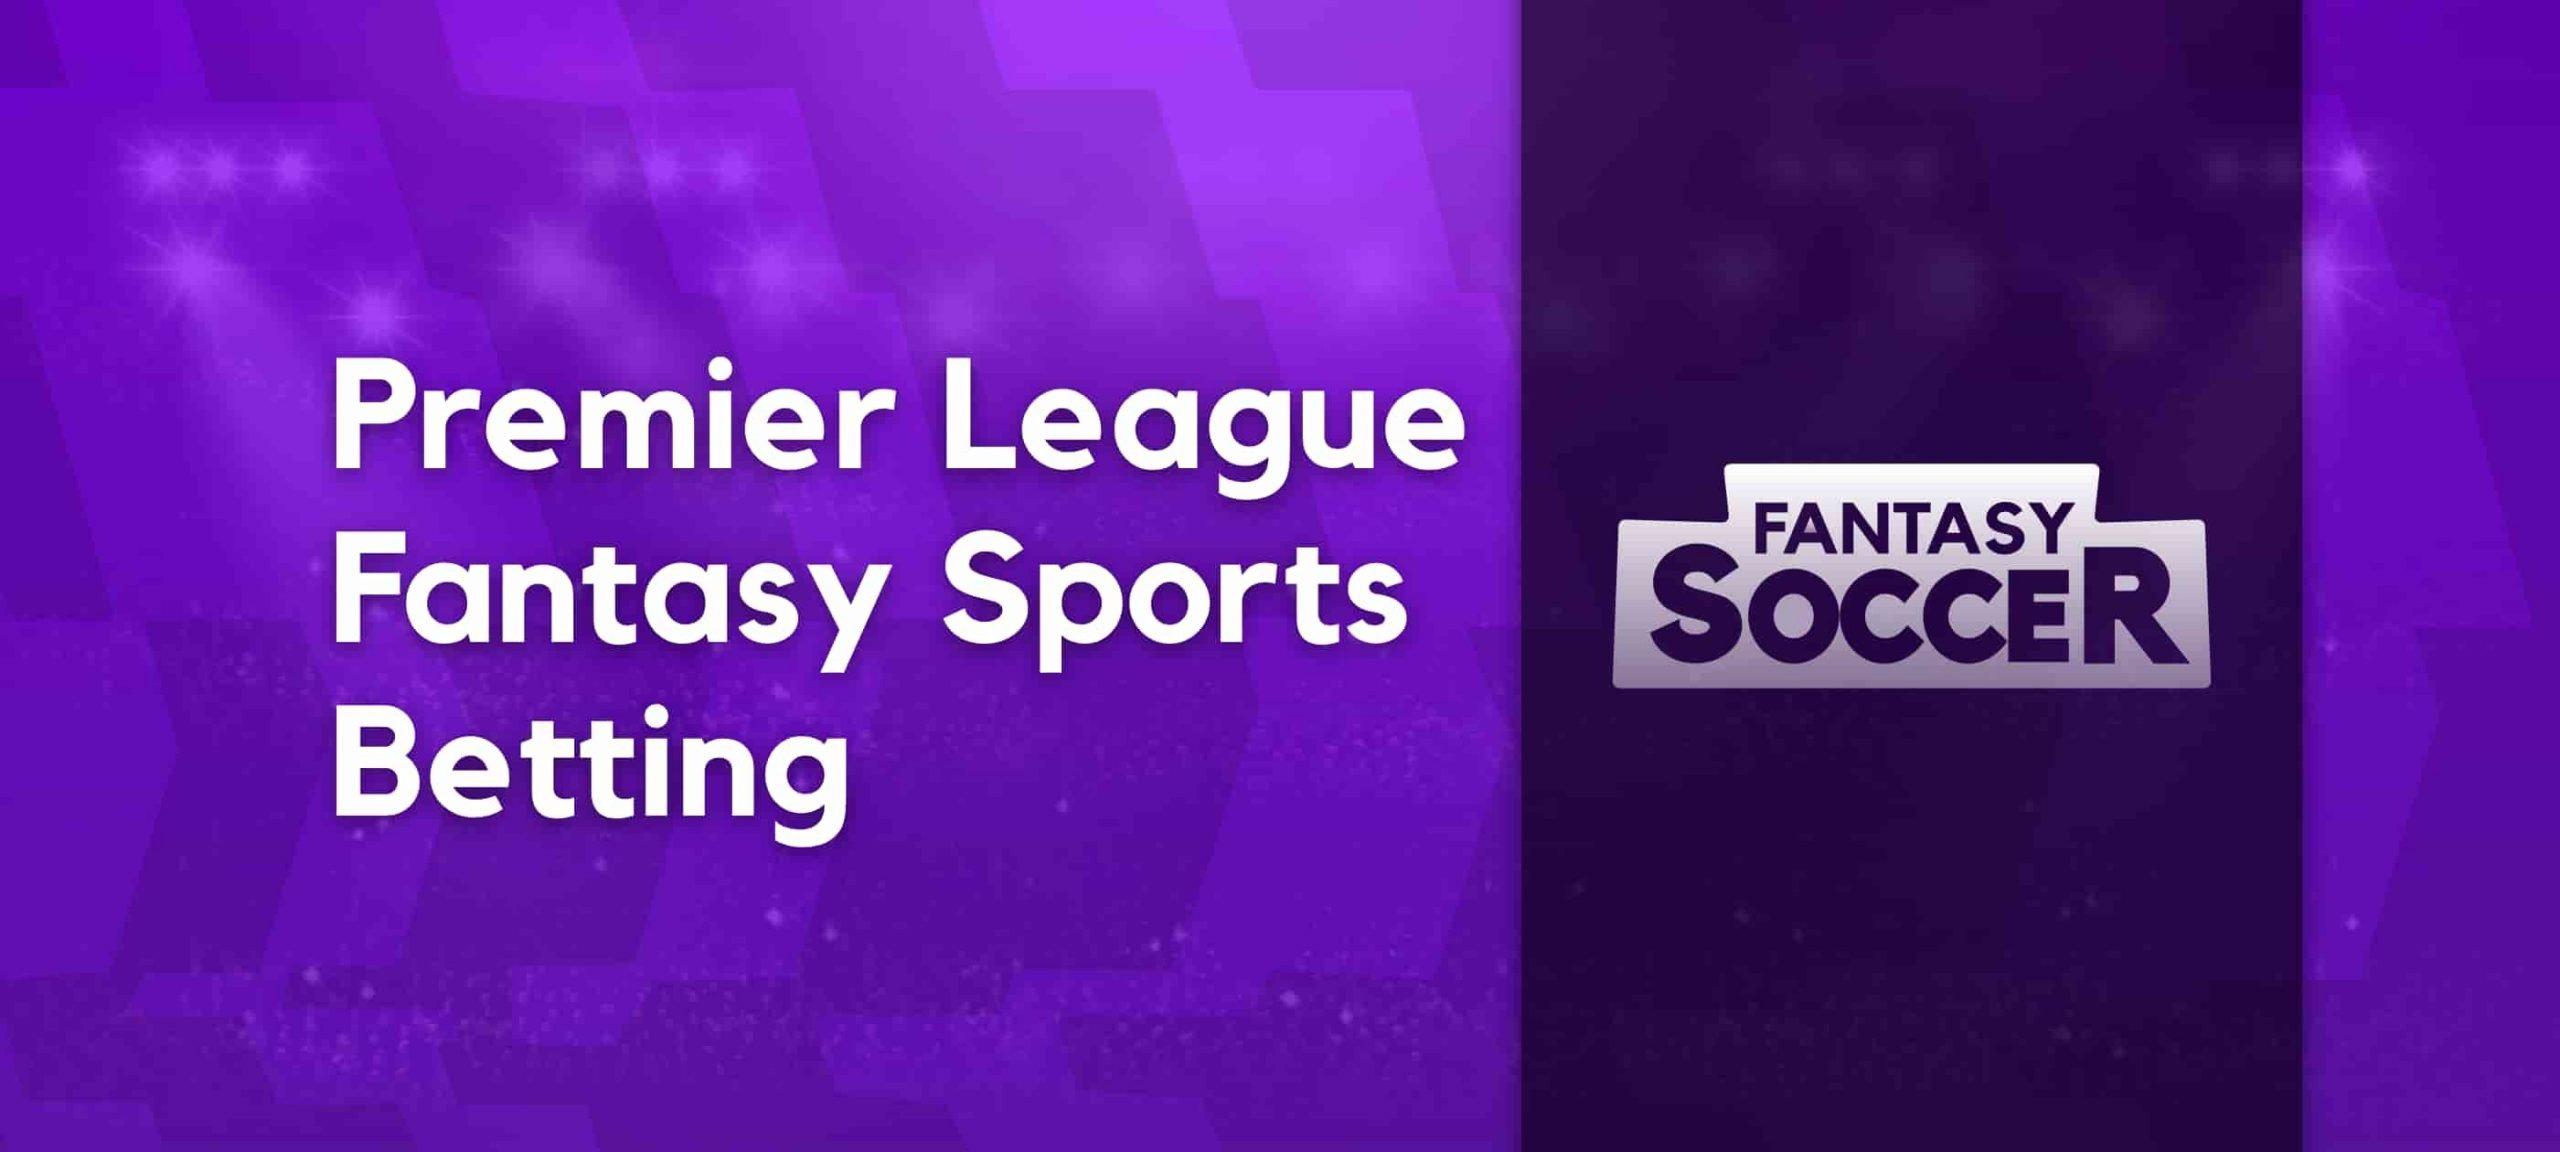 Premier League Fantasy Betting Guide